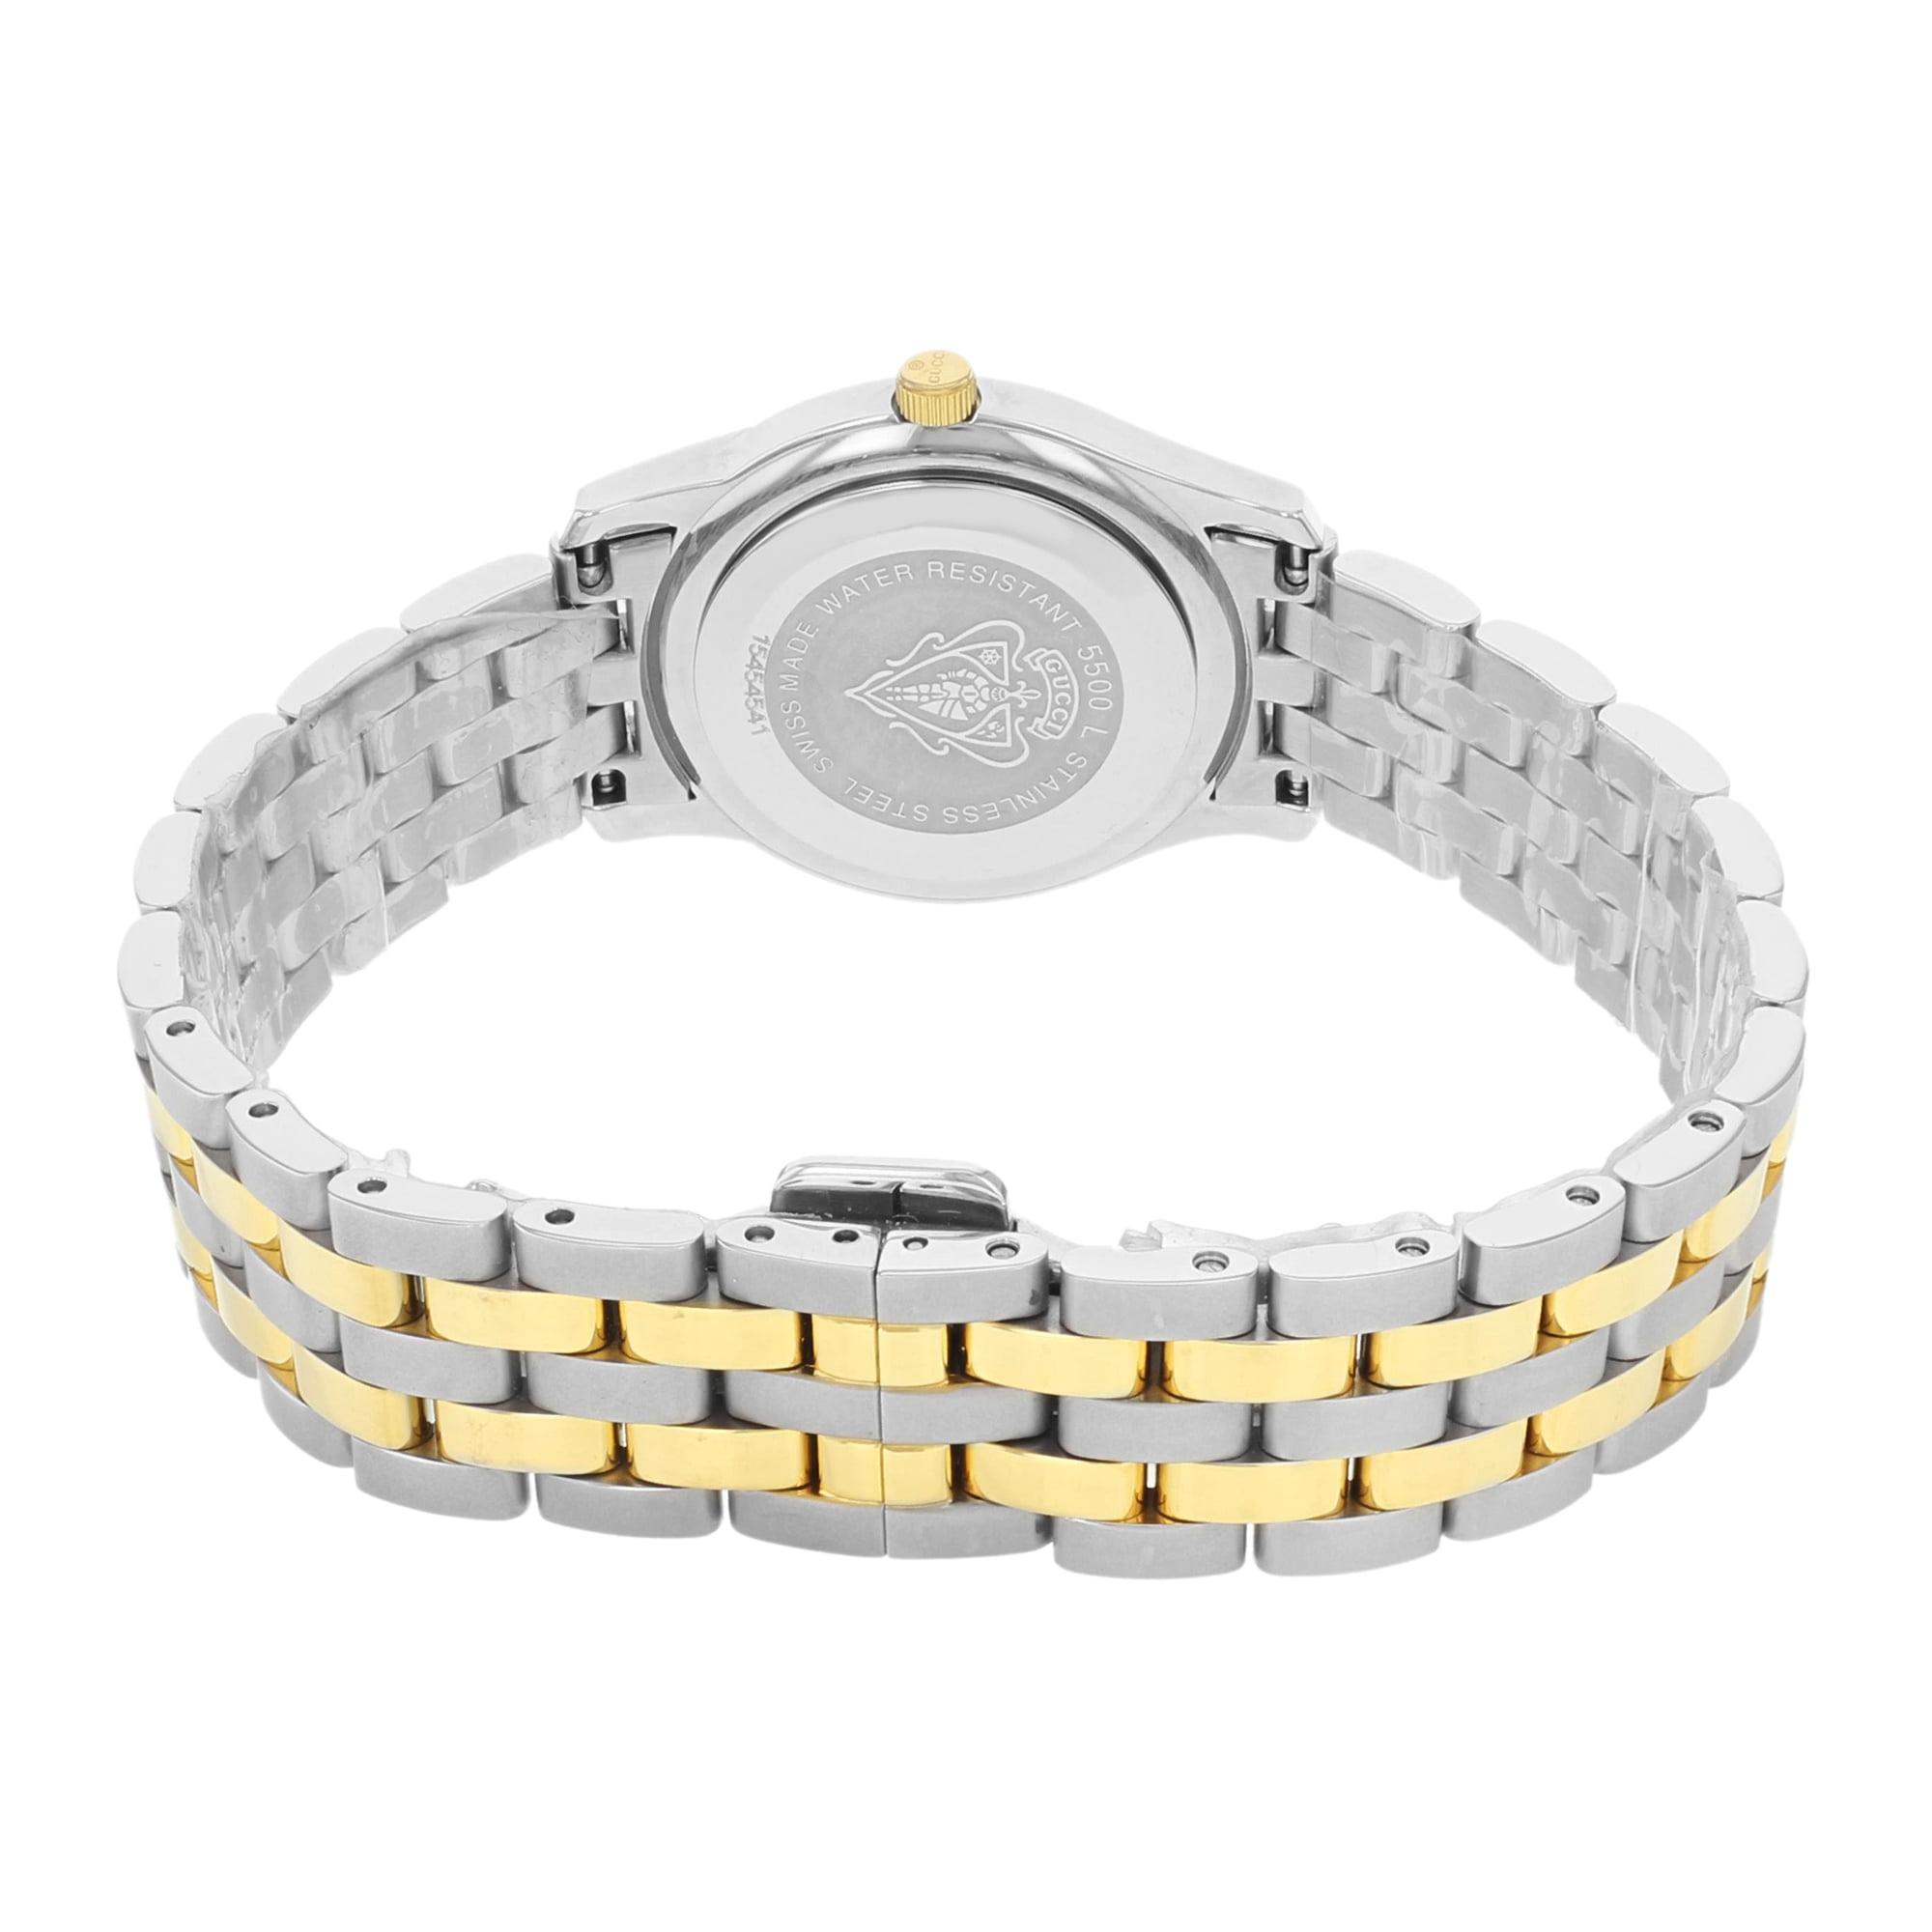 98fd0a83b59 Gucci - Pre-Owned Gucci 5500L White Dial Two Tone Stainless Steel Quartz  Ladies Watch YA055528 - Walmart.com